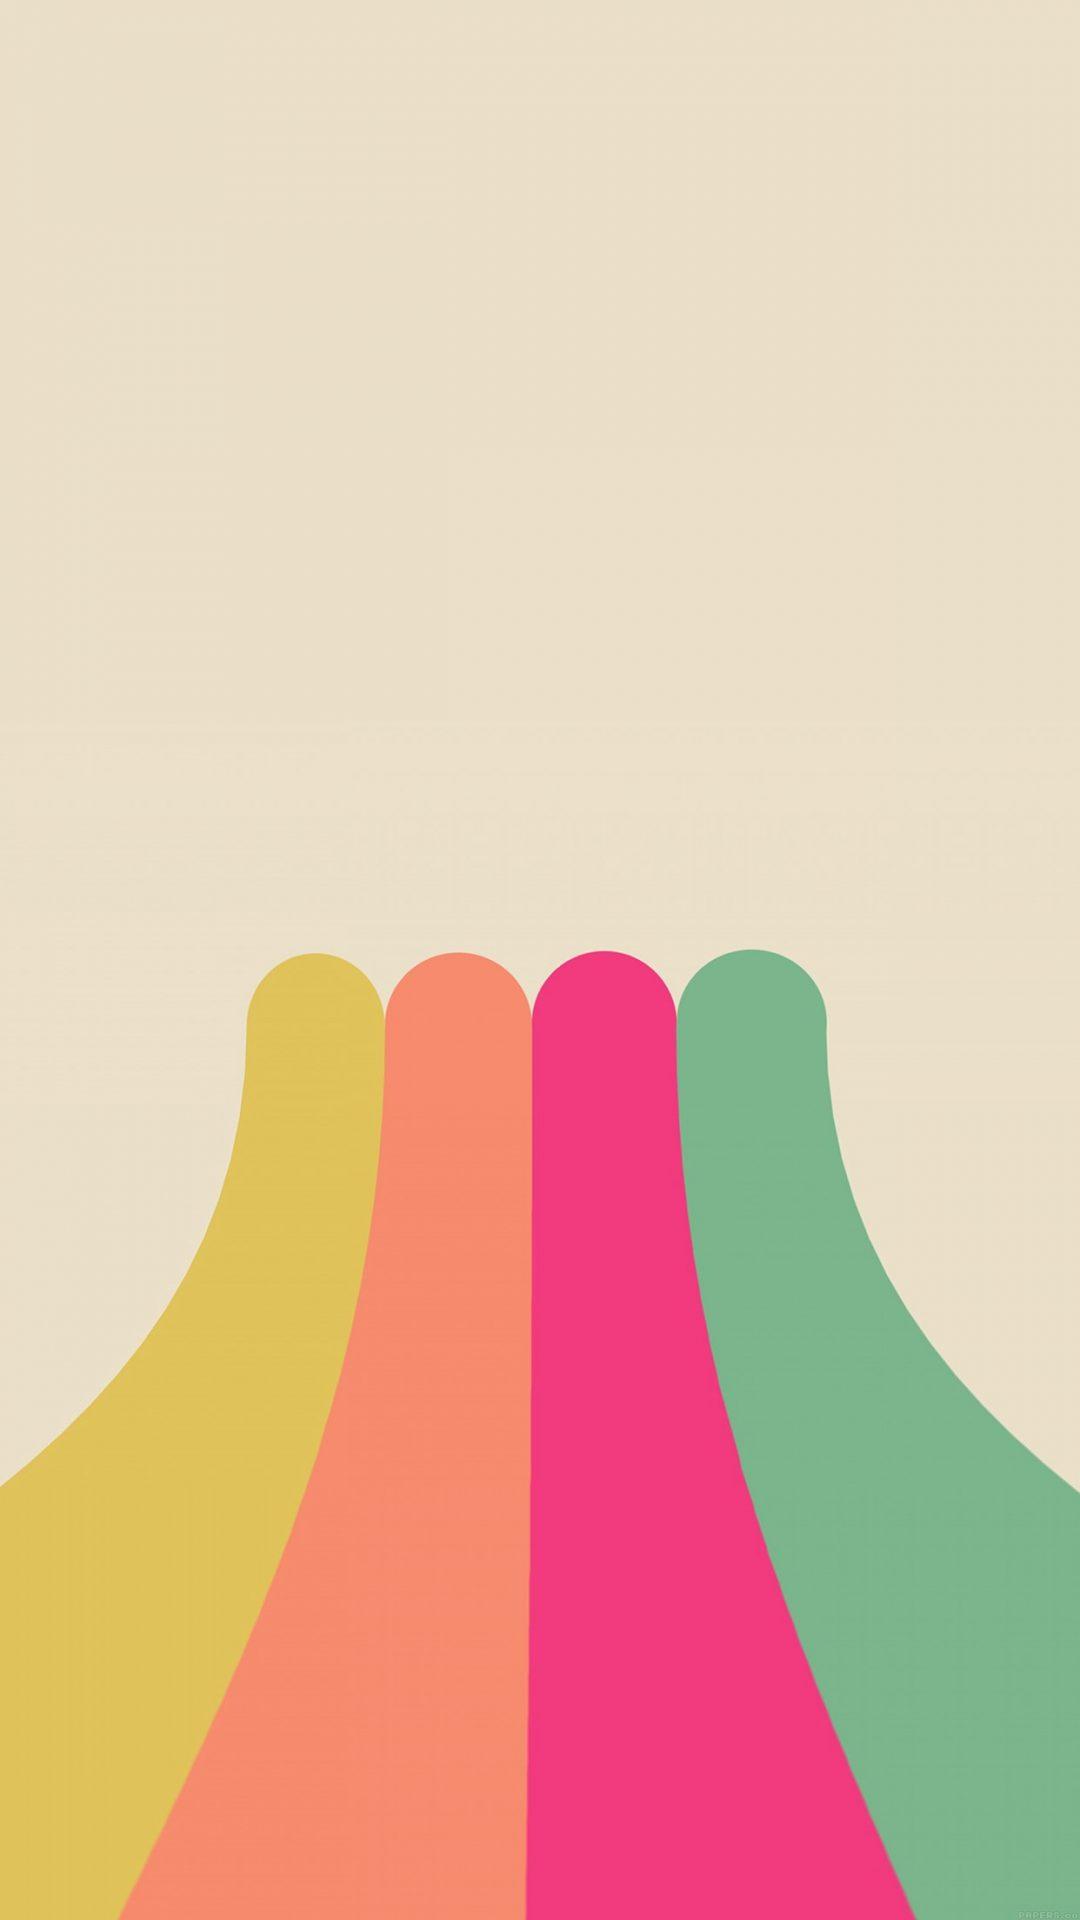 Rainbow Simple Minimal Abstract Pattern